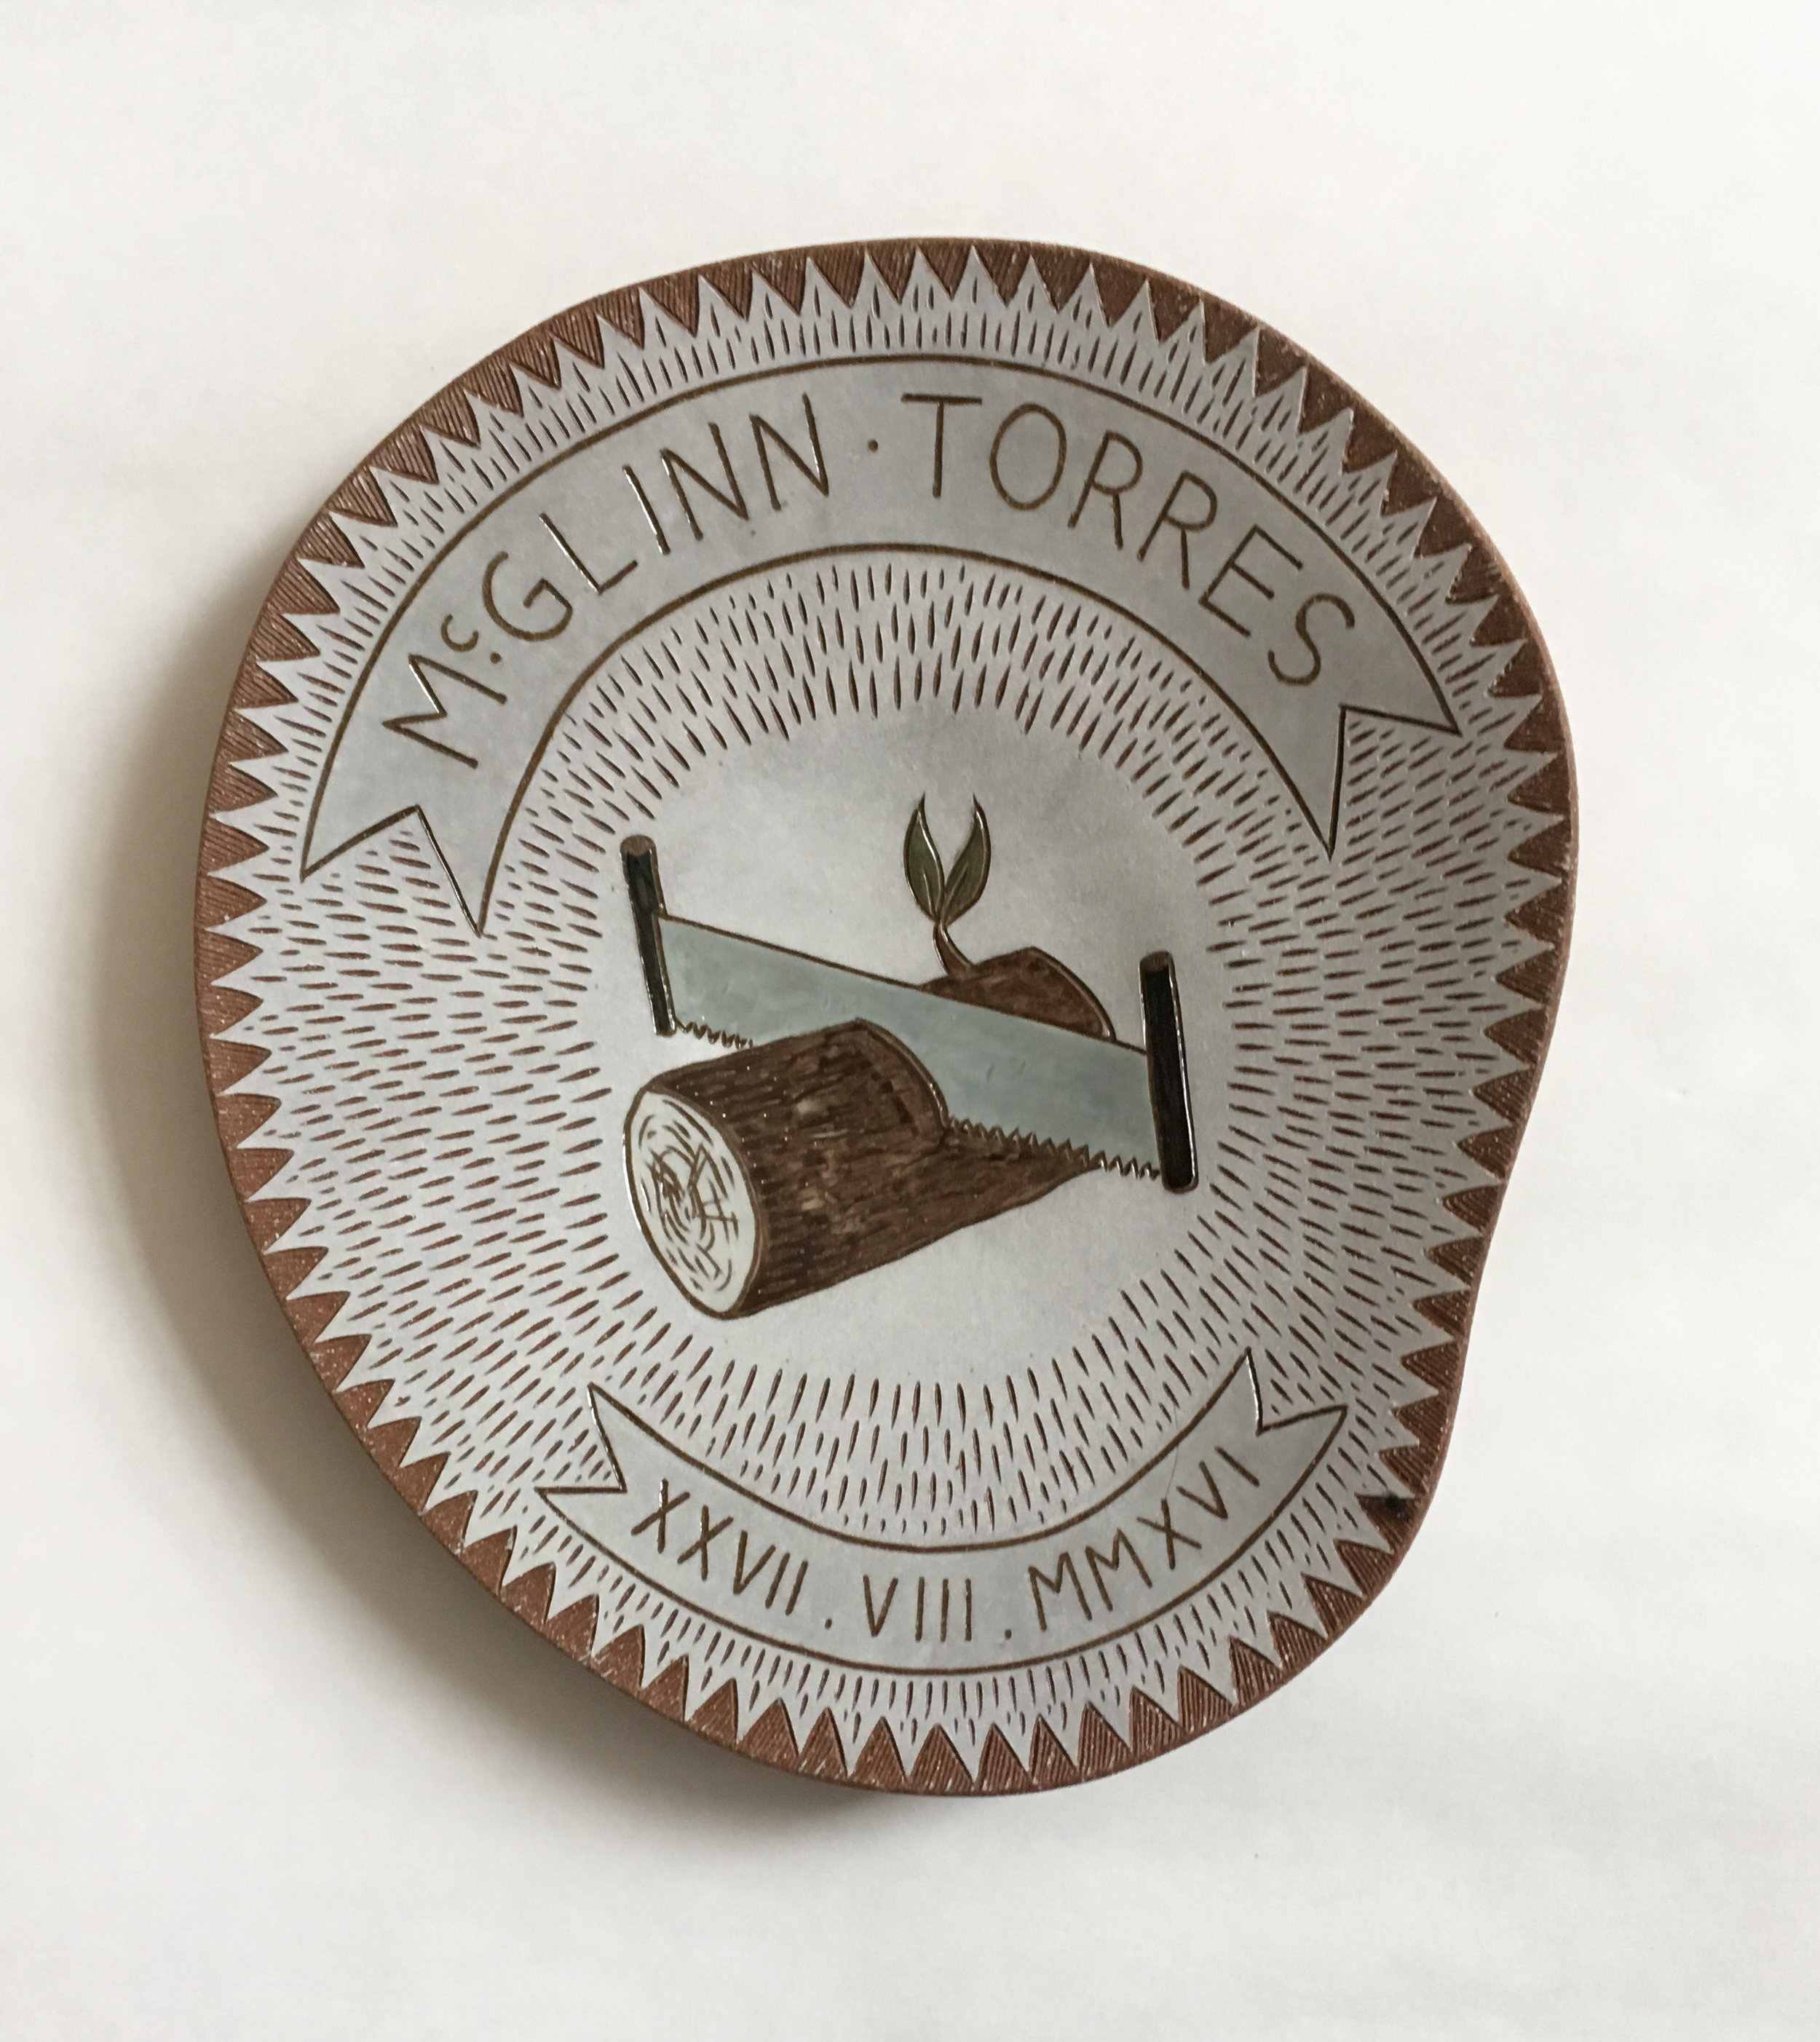 McGlinn - Torres Wedding Platter, 2016